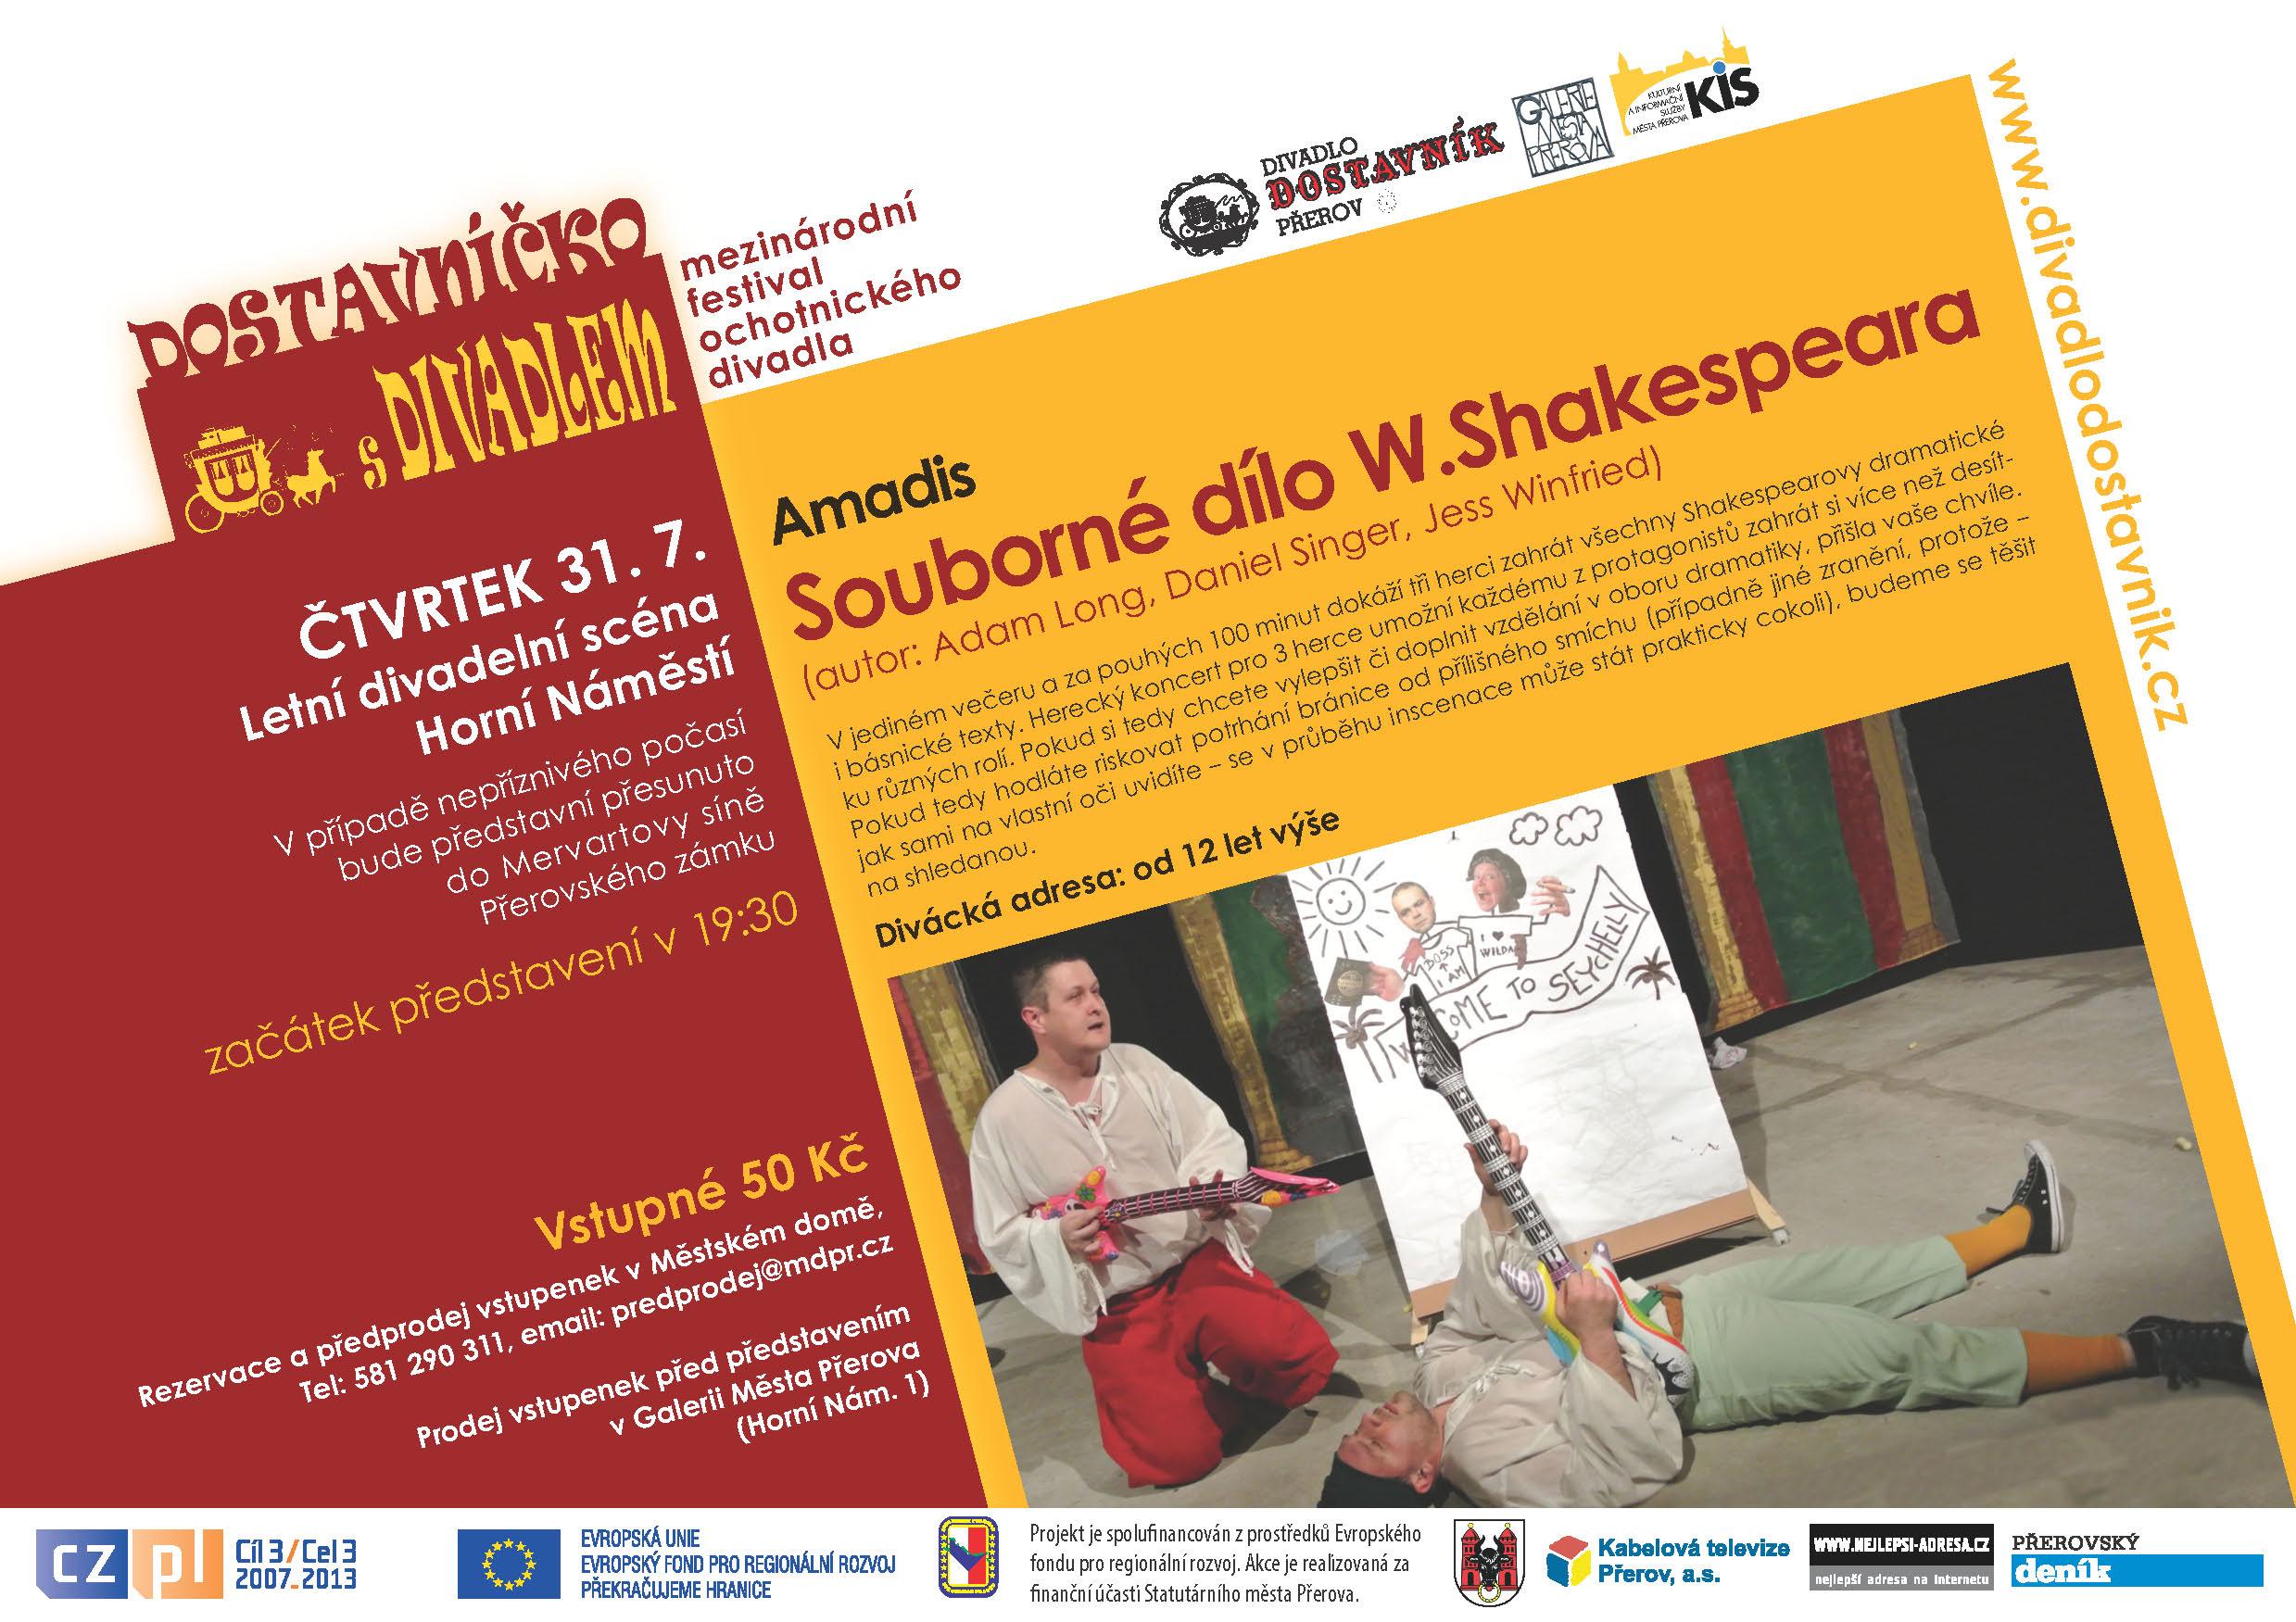 DS Amadis, Brno - Souborné dílo W. Shakespeara